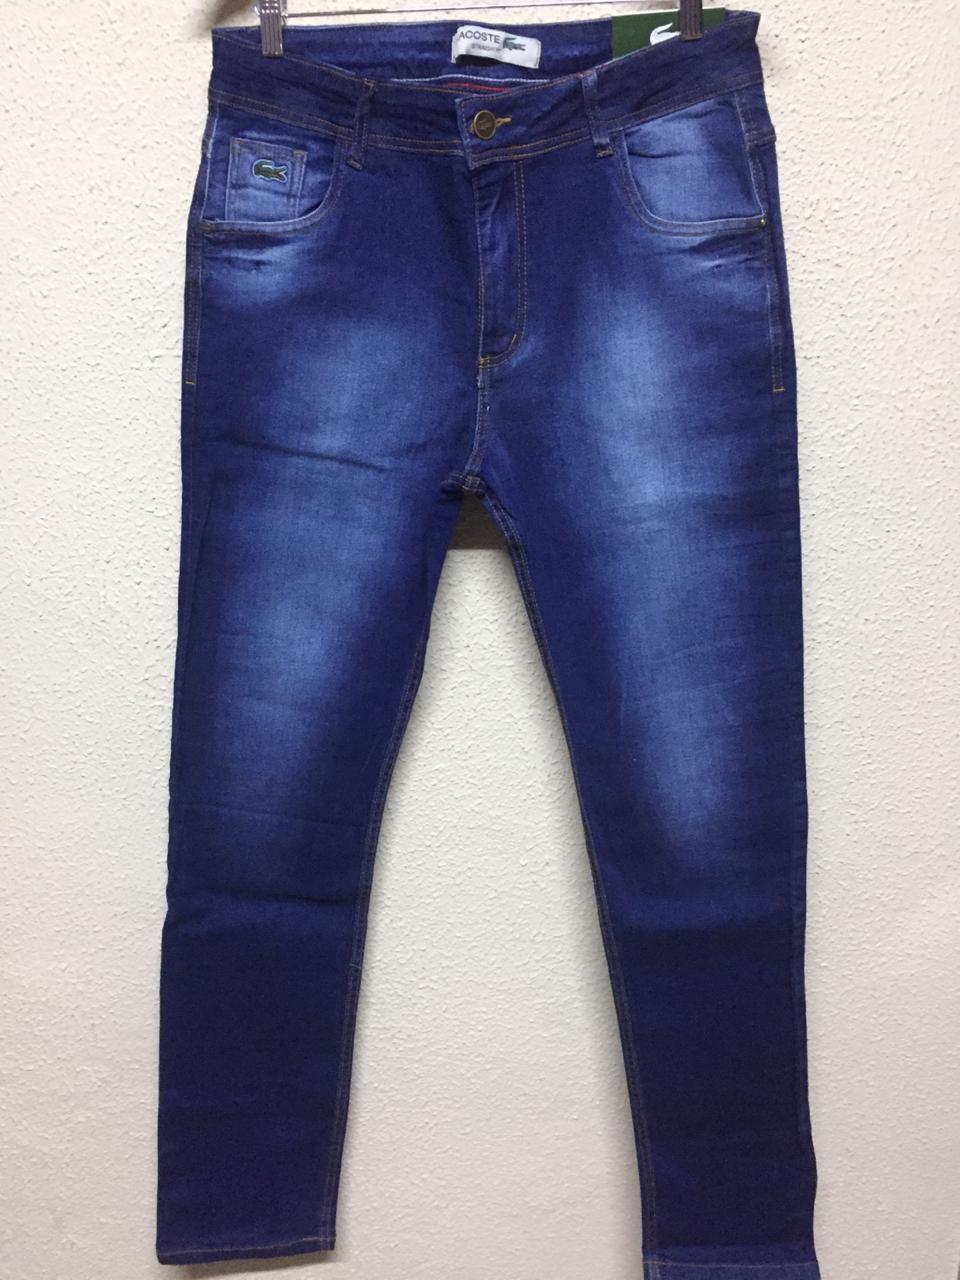 Calça Masculina Lacoste Jeans Lisa - Jeans Escuro